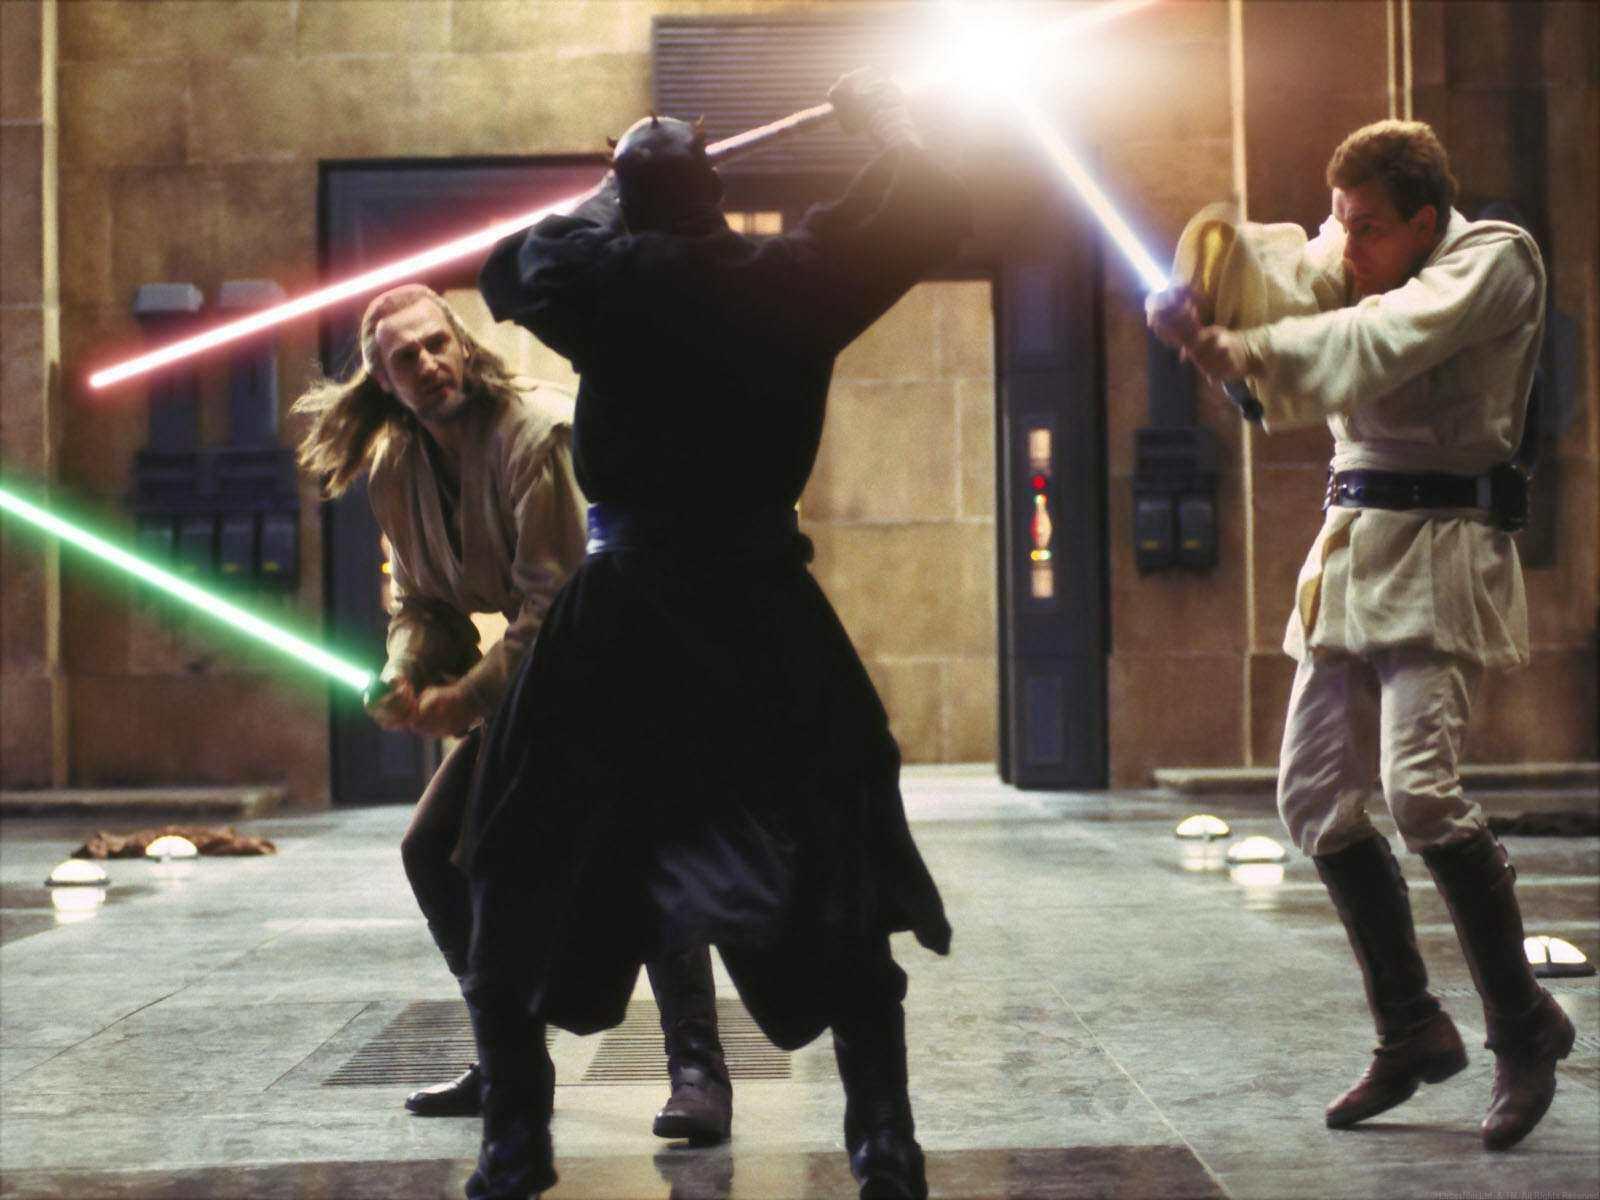 Obi-Wan-vs-Darth-Maul-obi-wan-kenobi-20389043-1600-1200